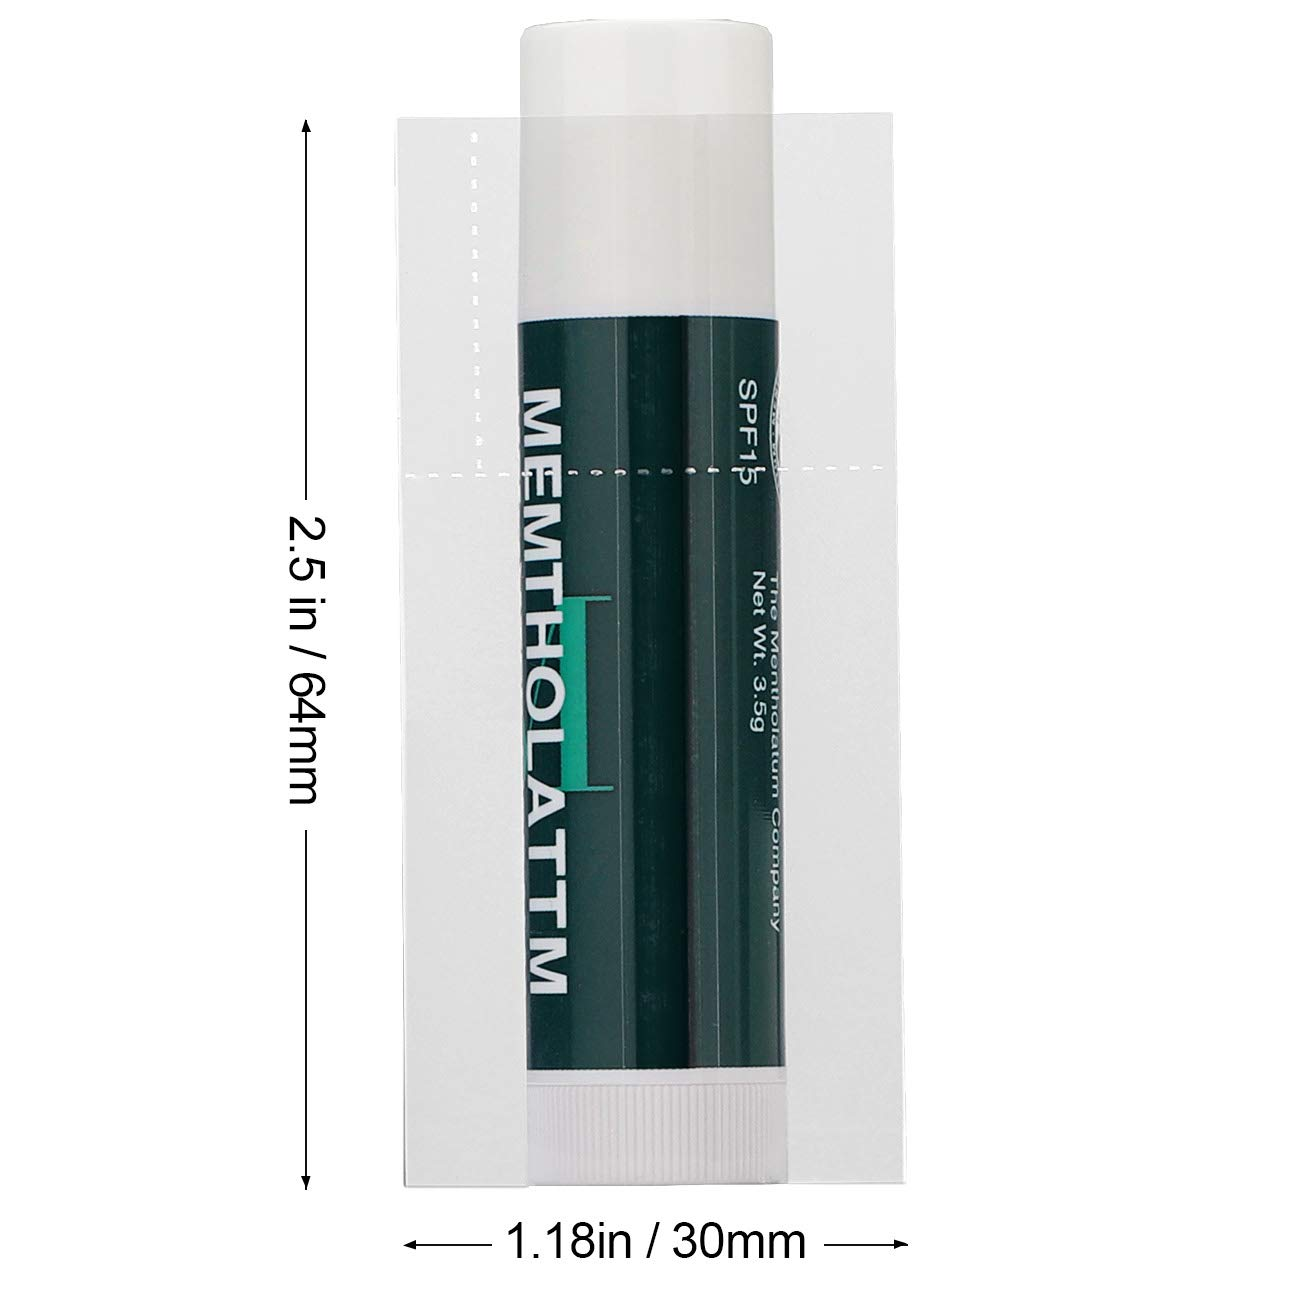 MORIDA Lip Balm Shrink Bands 200 pcs 64x30 mm Clear PVC Heat Wrap Sealer Fits Chapstick Style Lip Balm Tubes